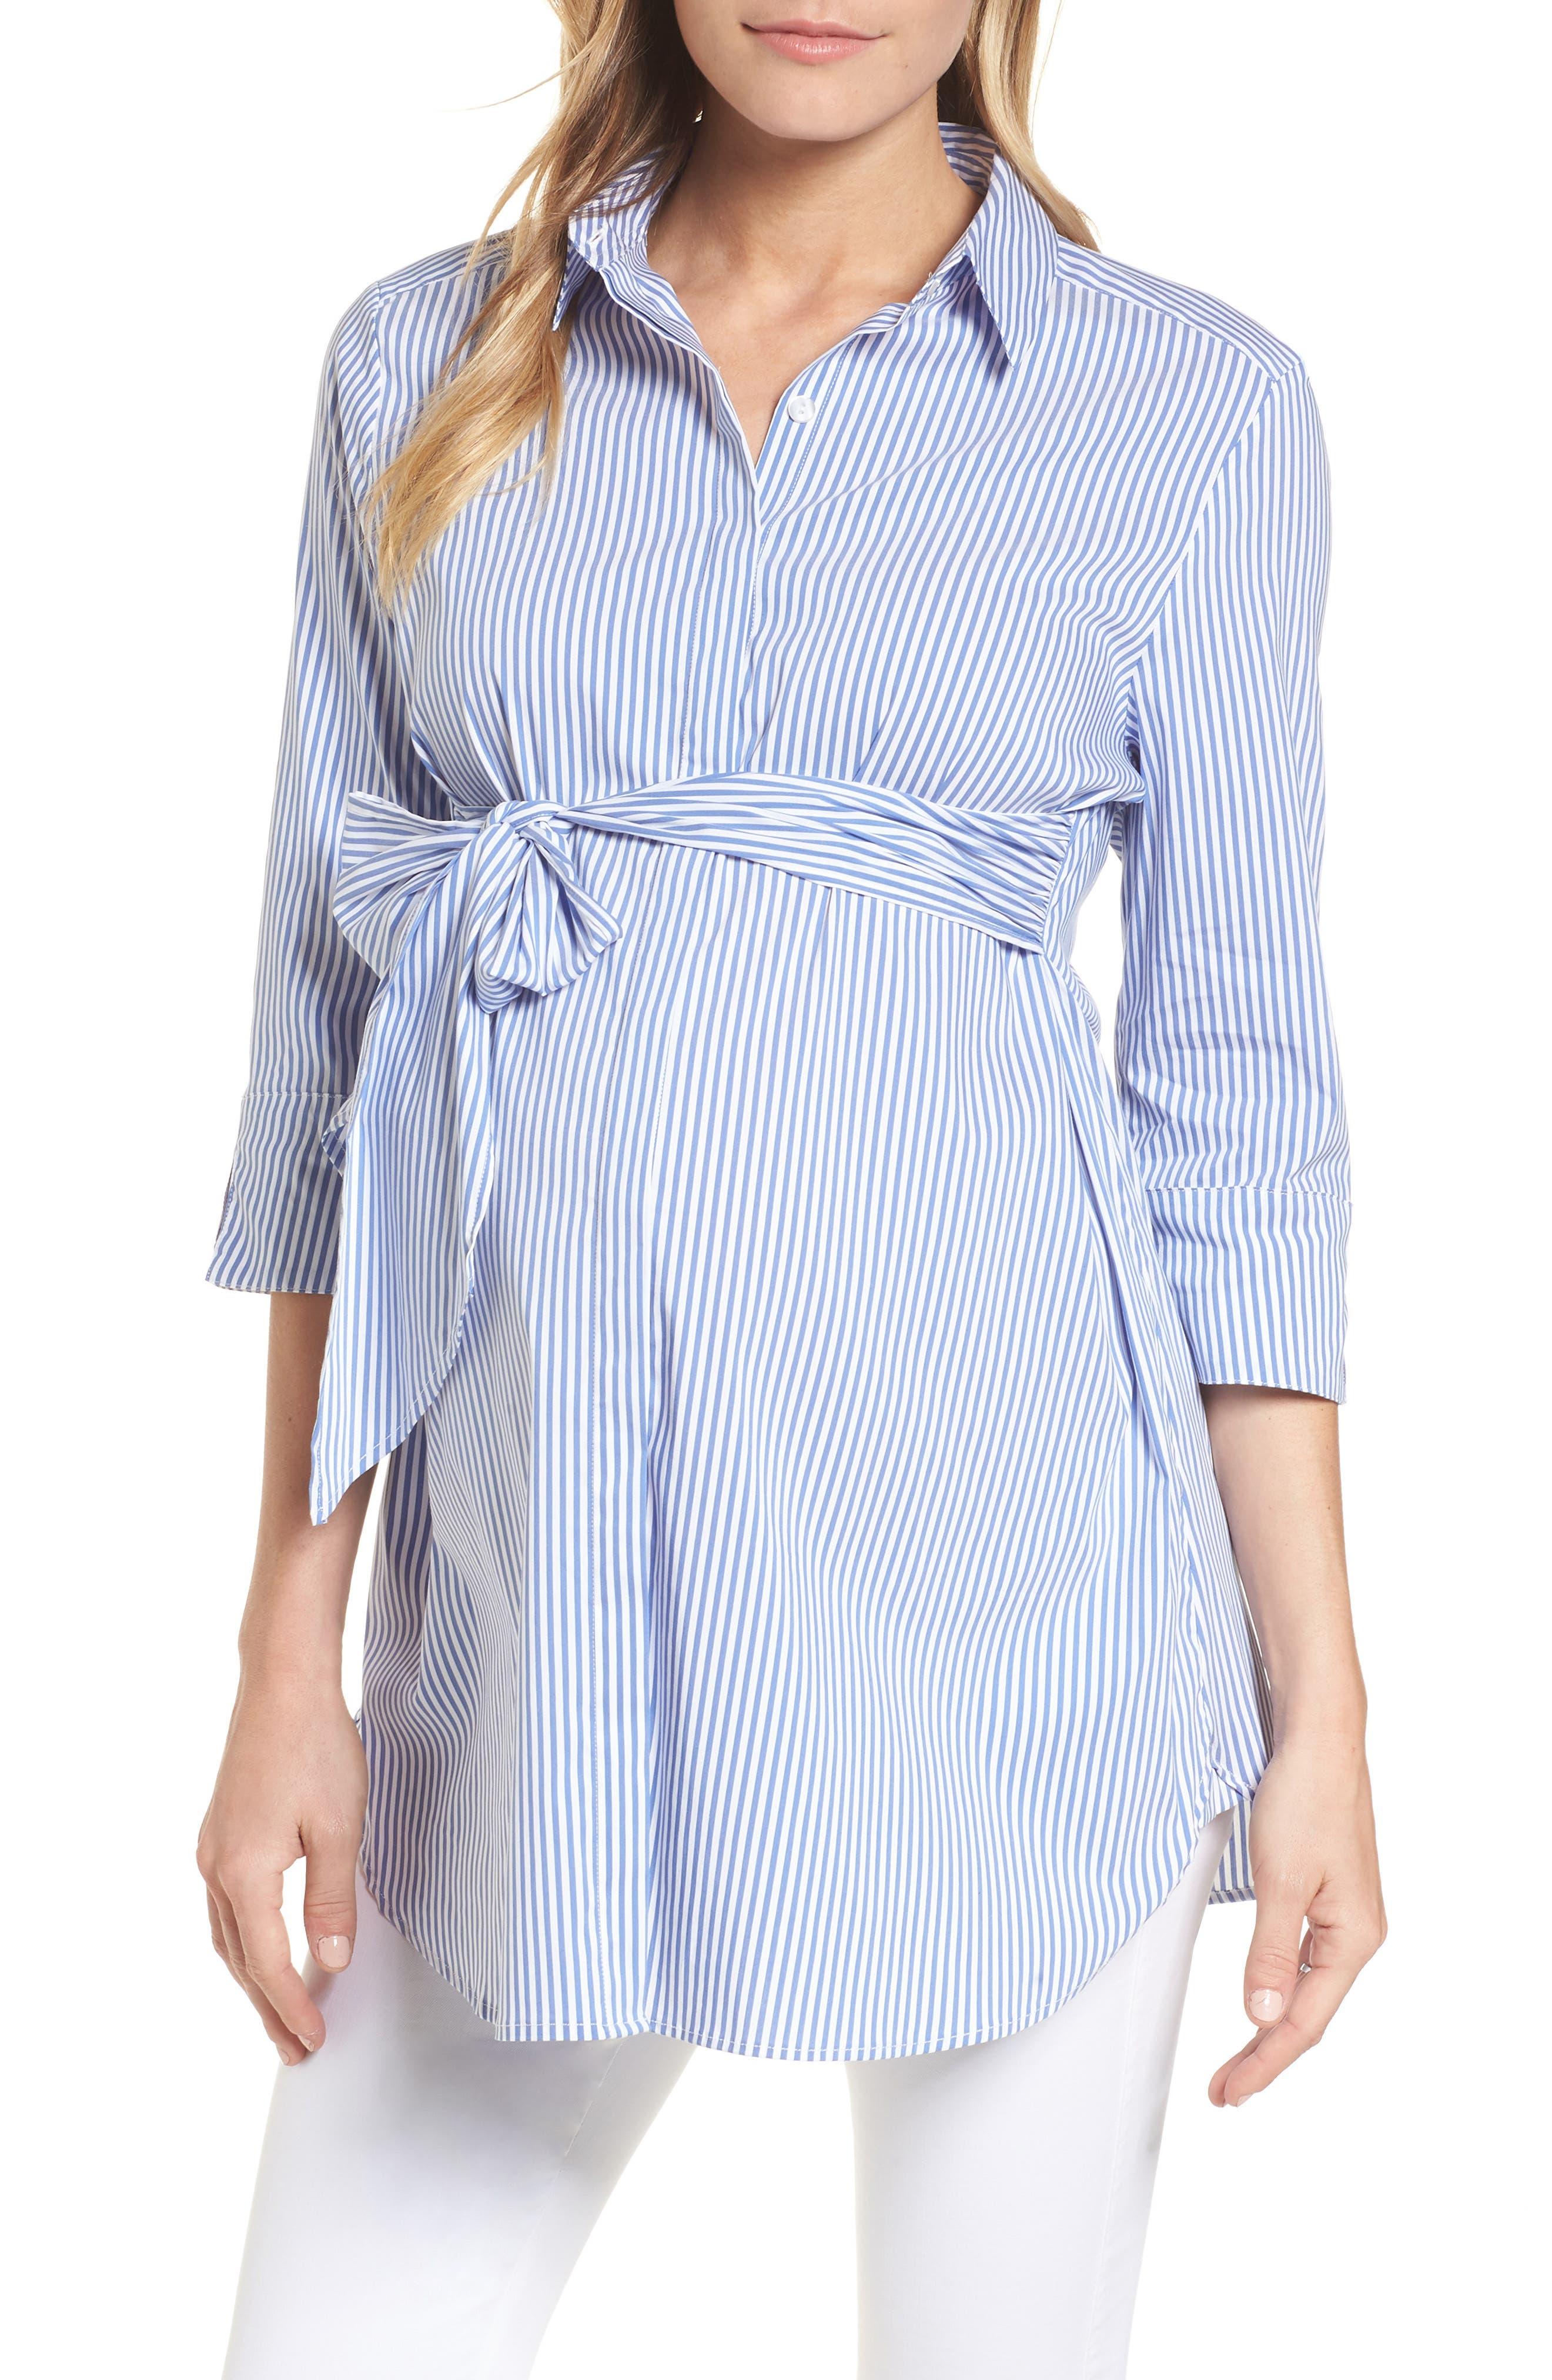 Dora Tie Front Maternity Shirt,                         Main,                         color, BLUE/WHITE STRIPE